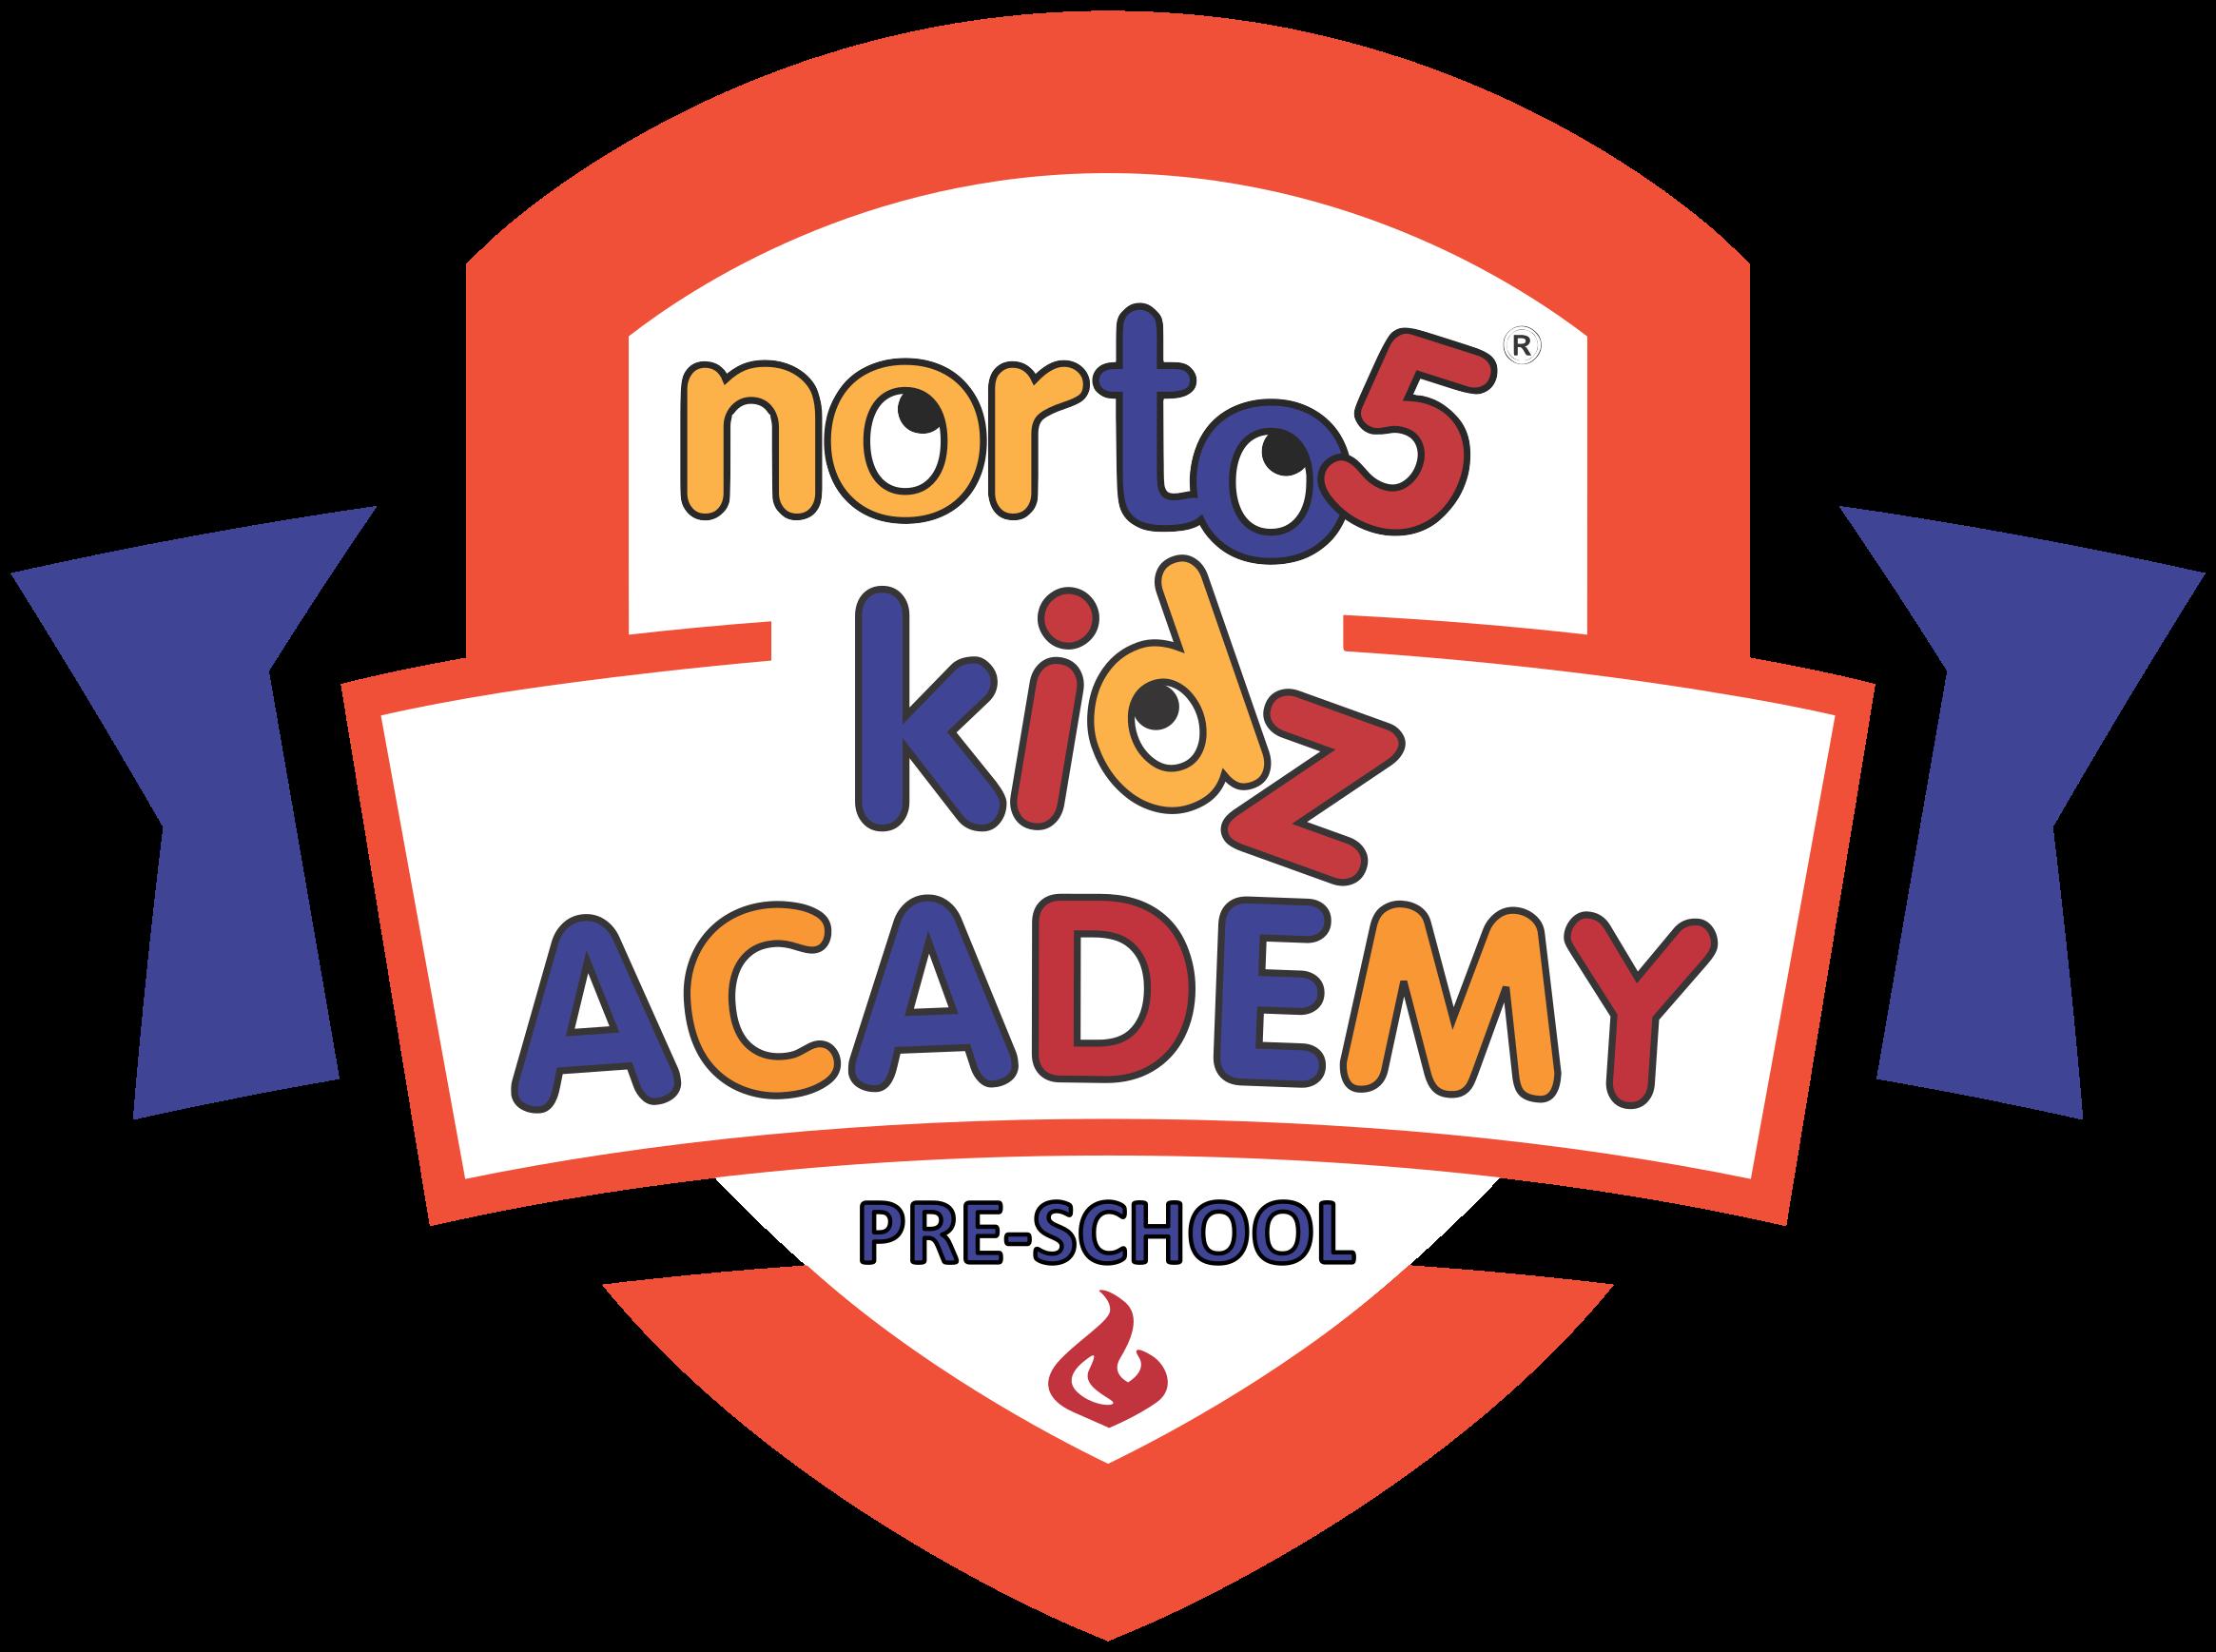 Norto5 KIDZ Academy